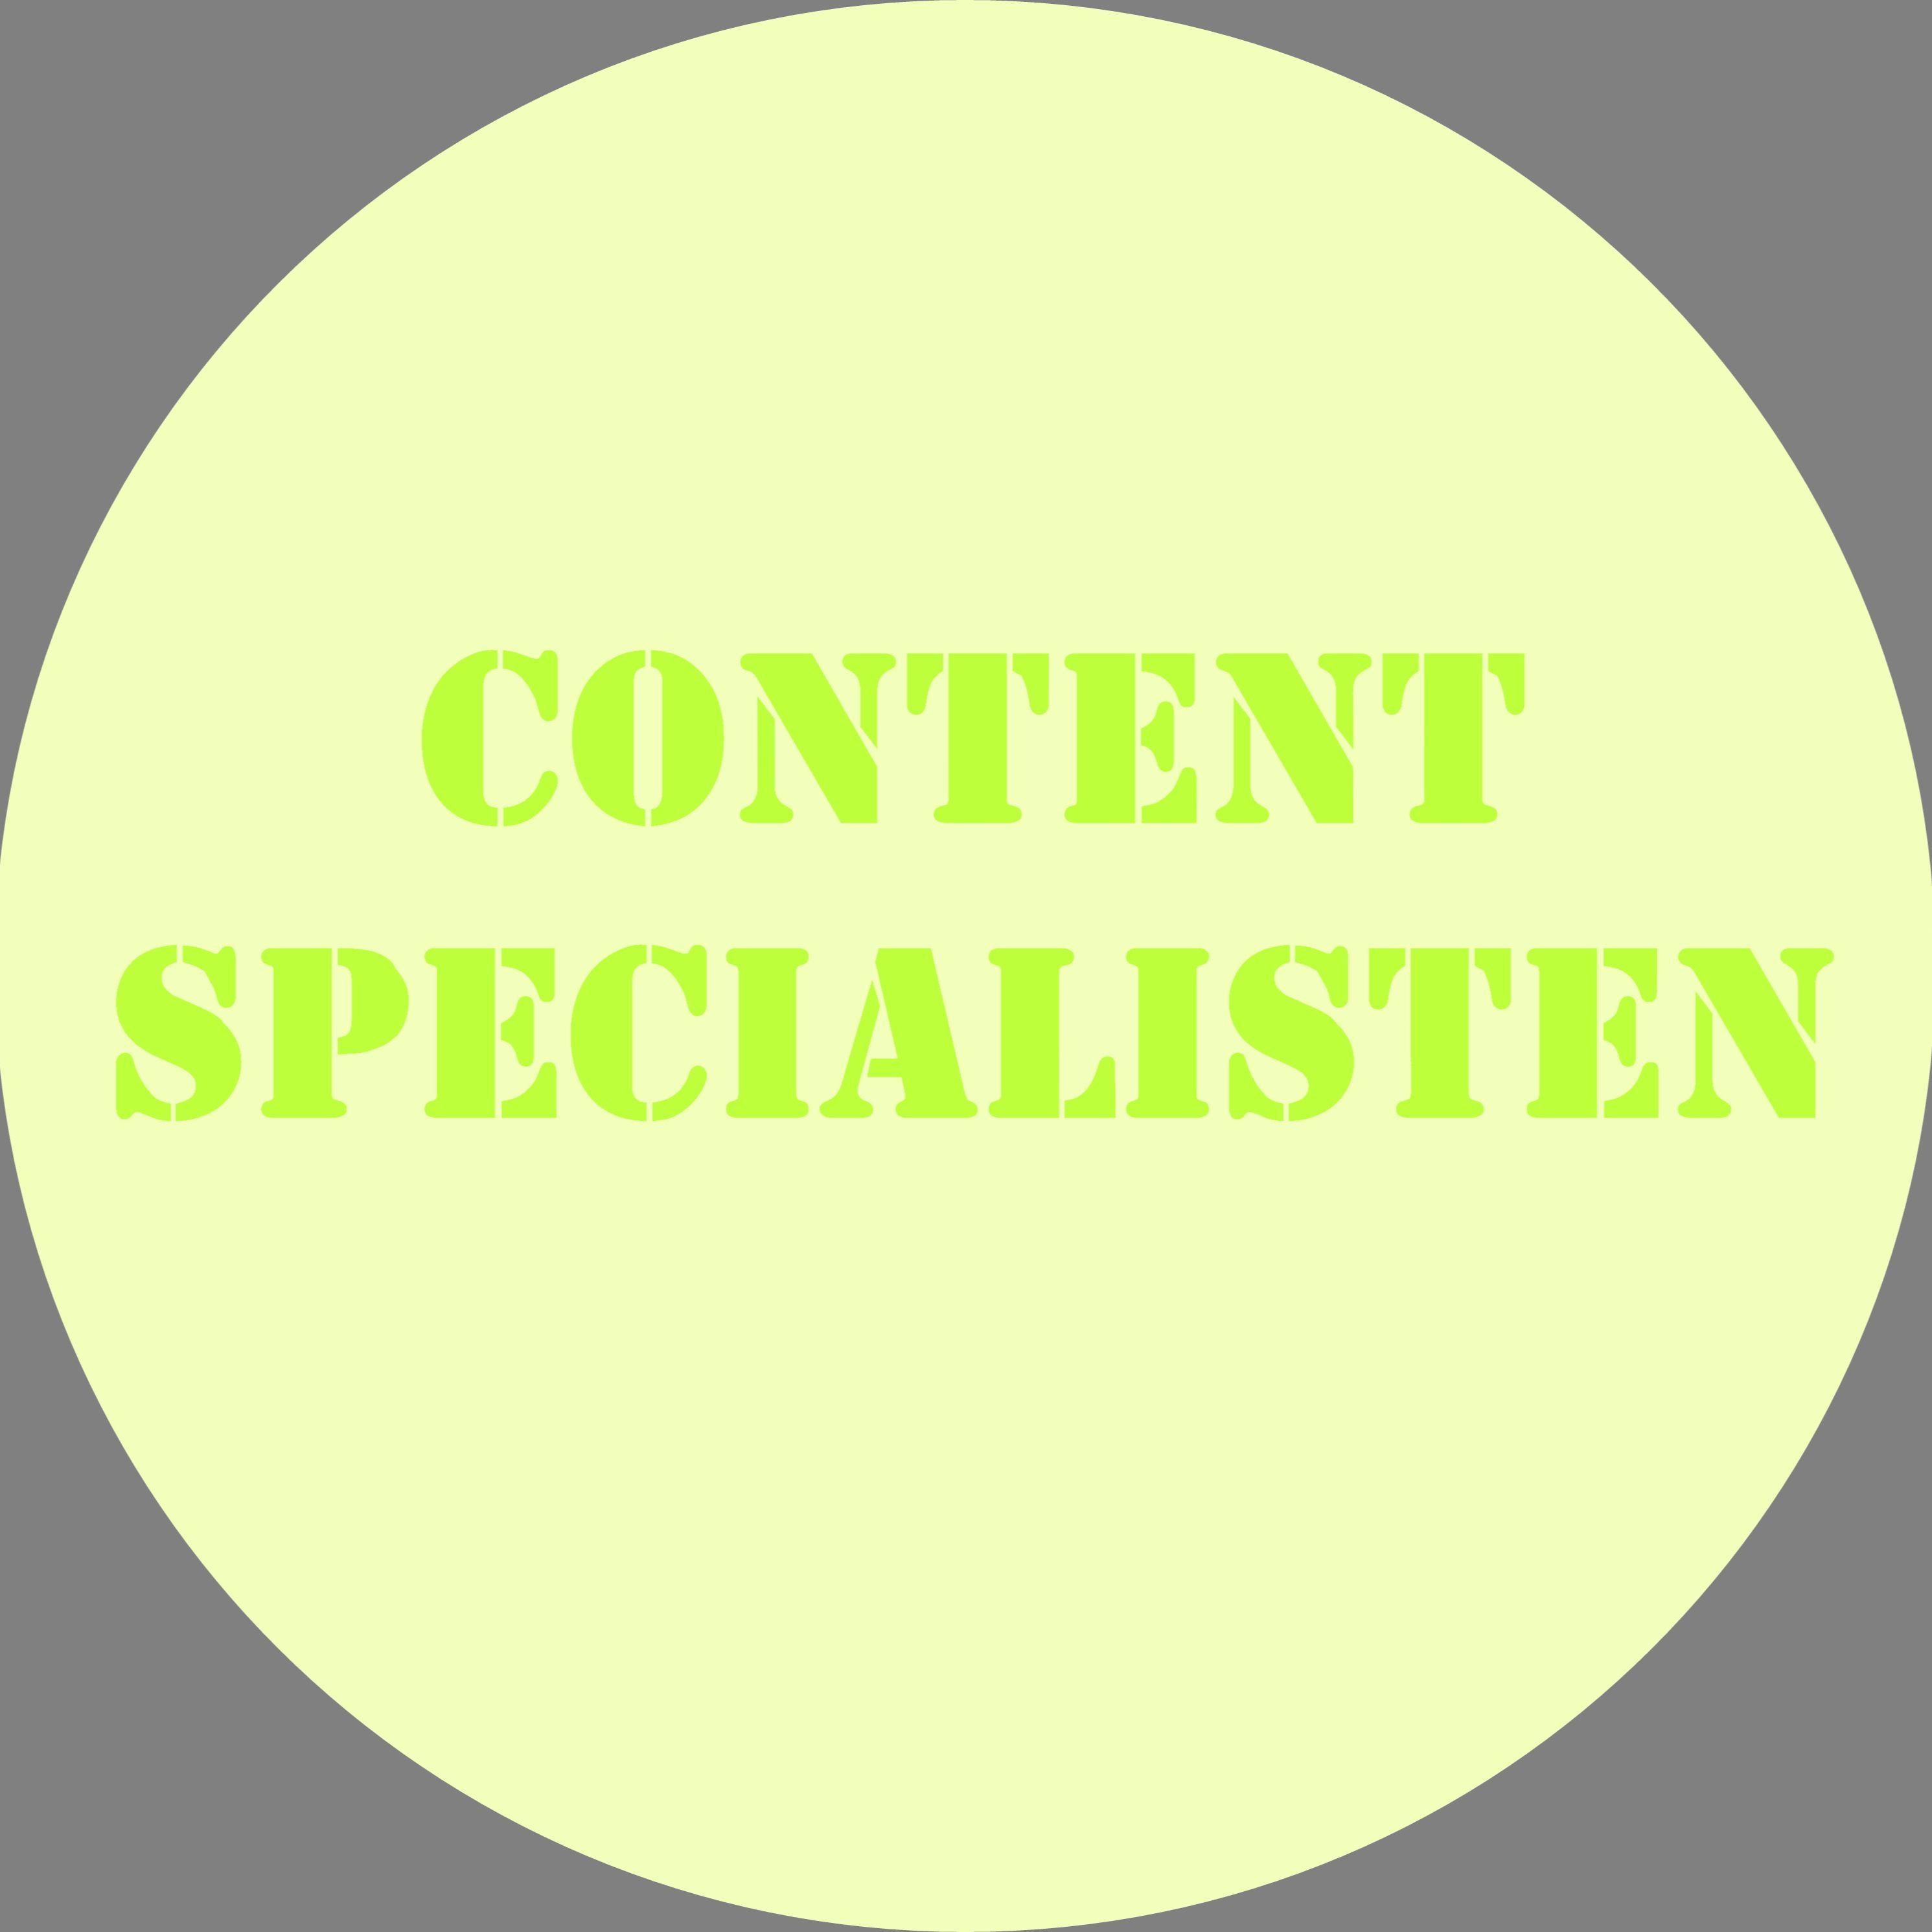 Contentspecialisten logo